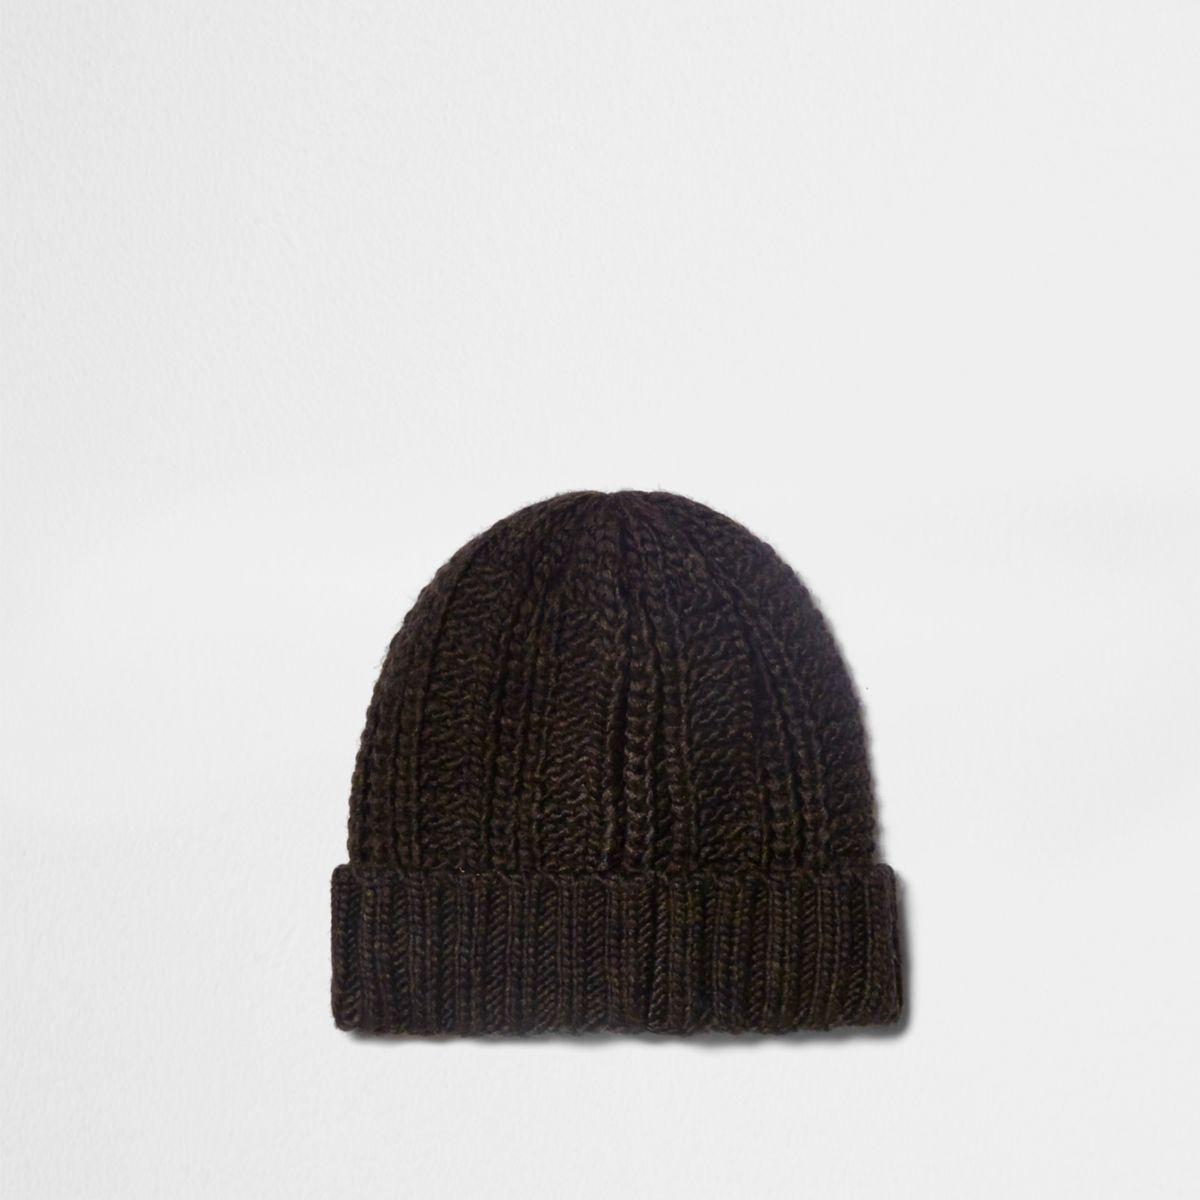 Brown fisherman knit beanie hat